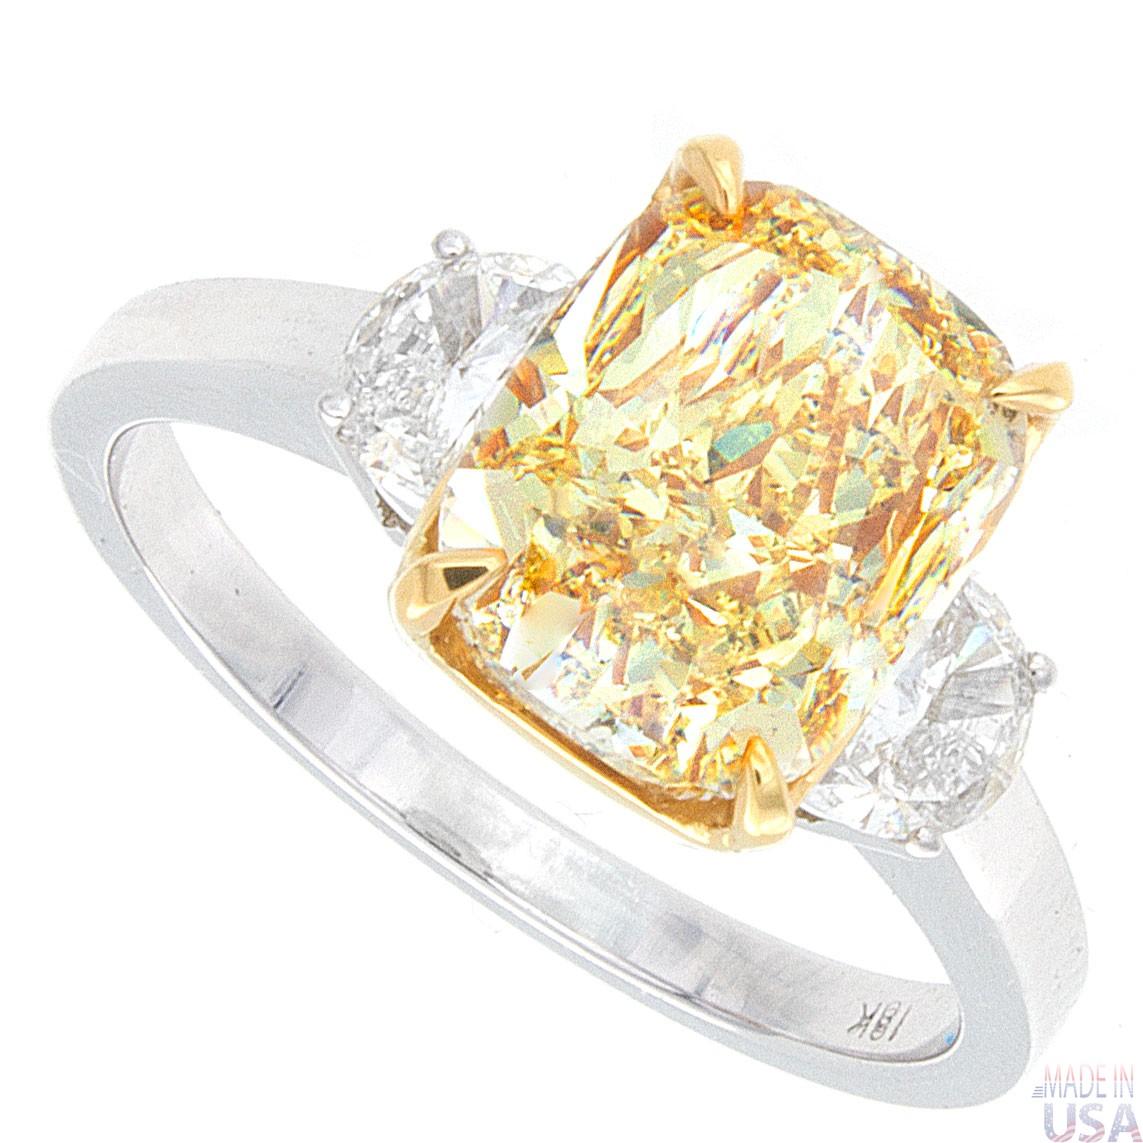 Well-known 3.30ct Cushion Cut Fancy Light Yellow VVS Certified Diamond  MJ95